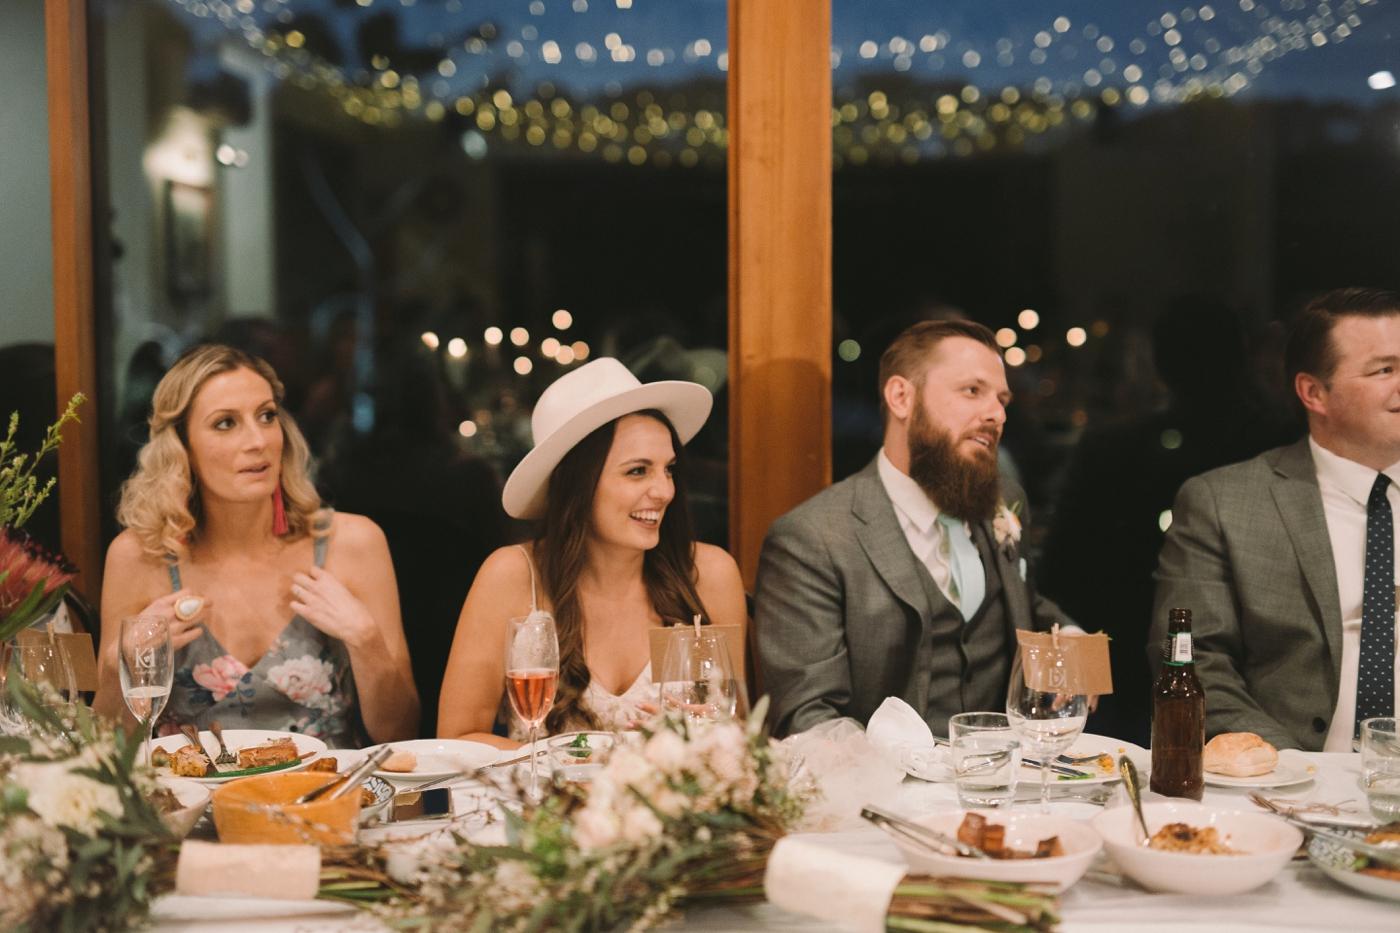 Maddy & Wes - K1 by Geoff Hardy Wedding - Adelaide Wedding Photographer - Natural wedding photography in Adelaide - Katherine Schultz_0075.jpg